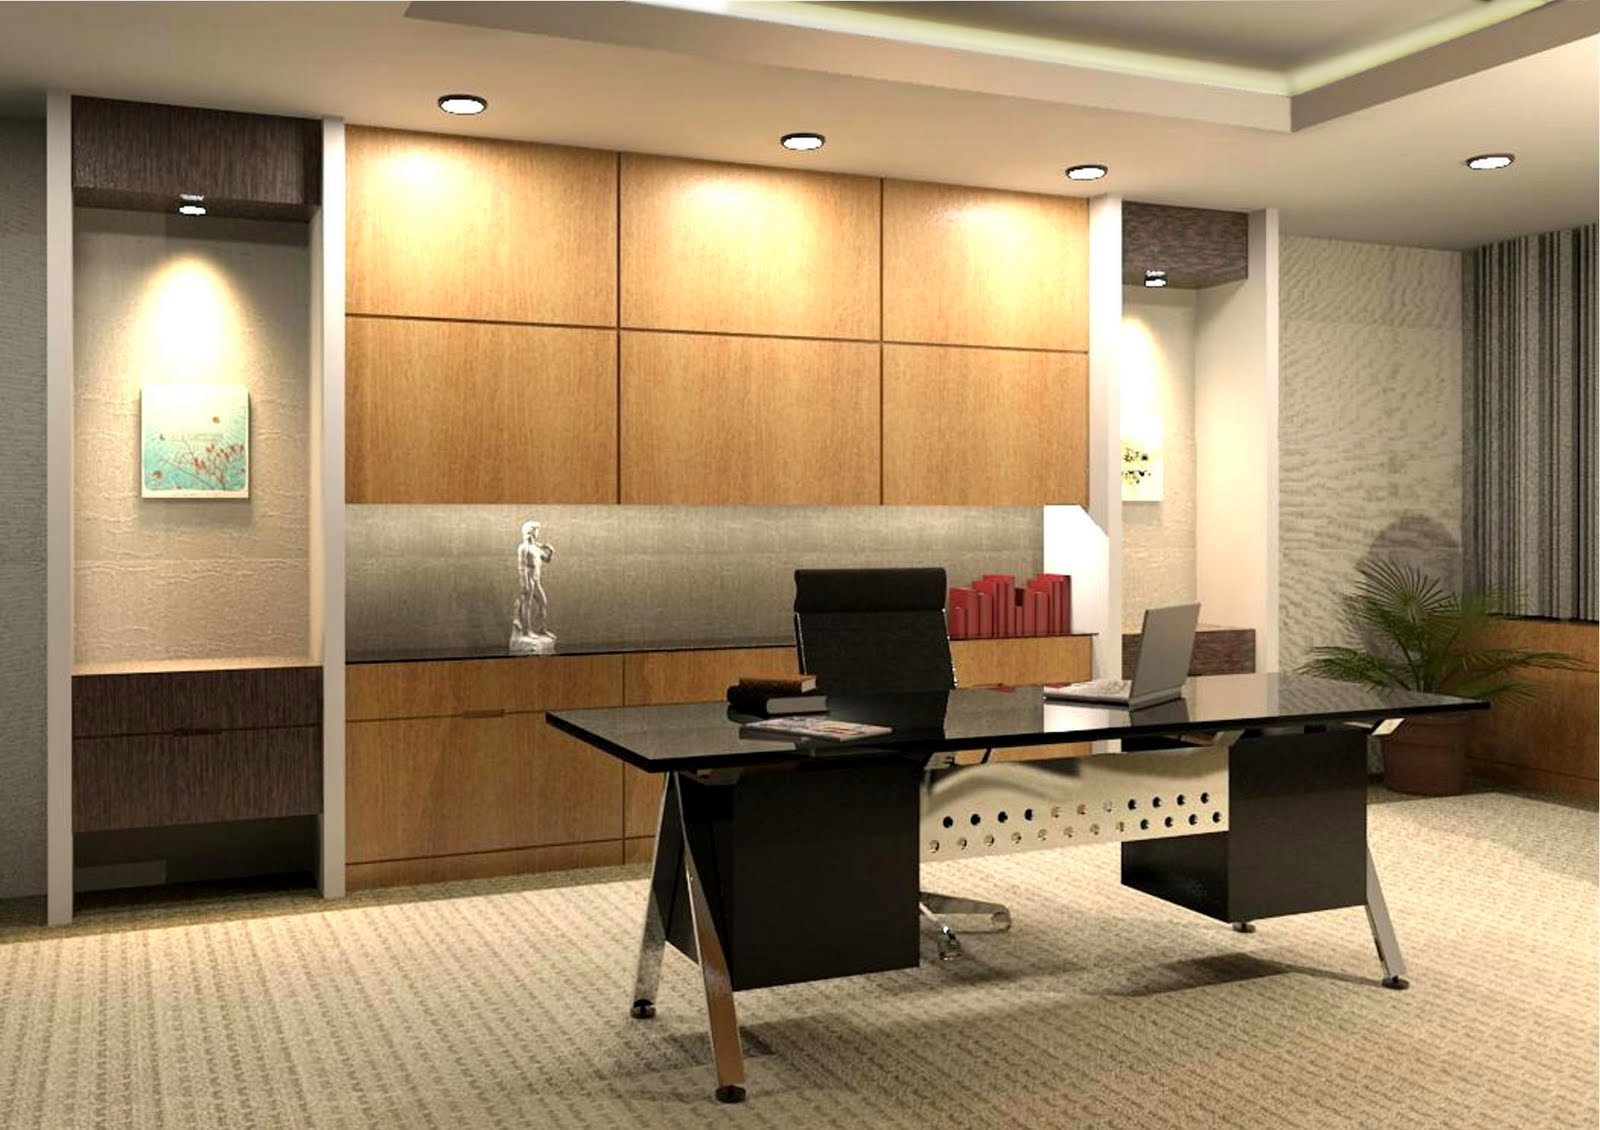 Modern work office decorating ideas : 15 inspiring designs